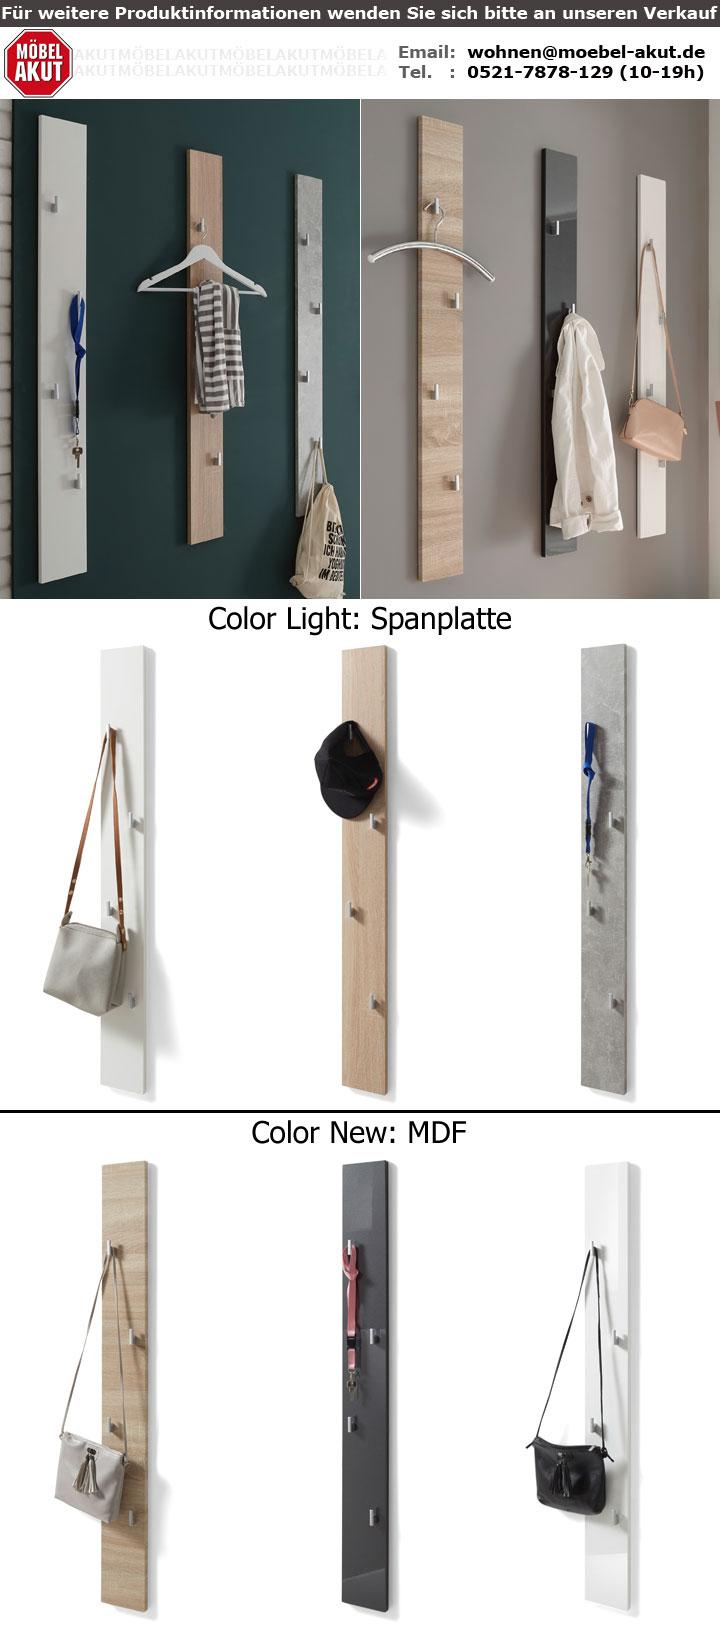 Paneel Wandpaneel Garderobe Wandgarderobe Flur Diele Color New MDF Eiche Sonoma